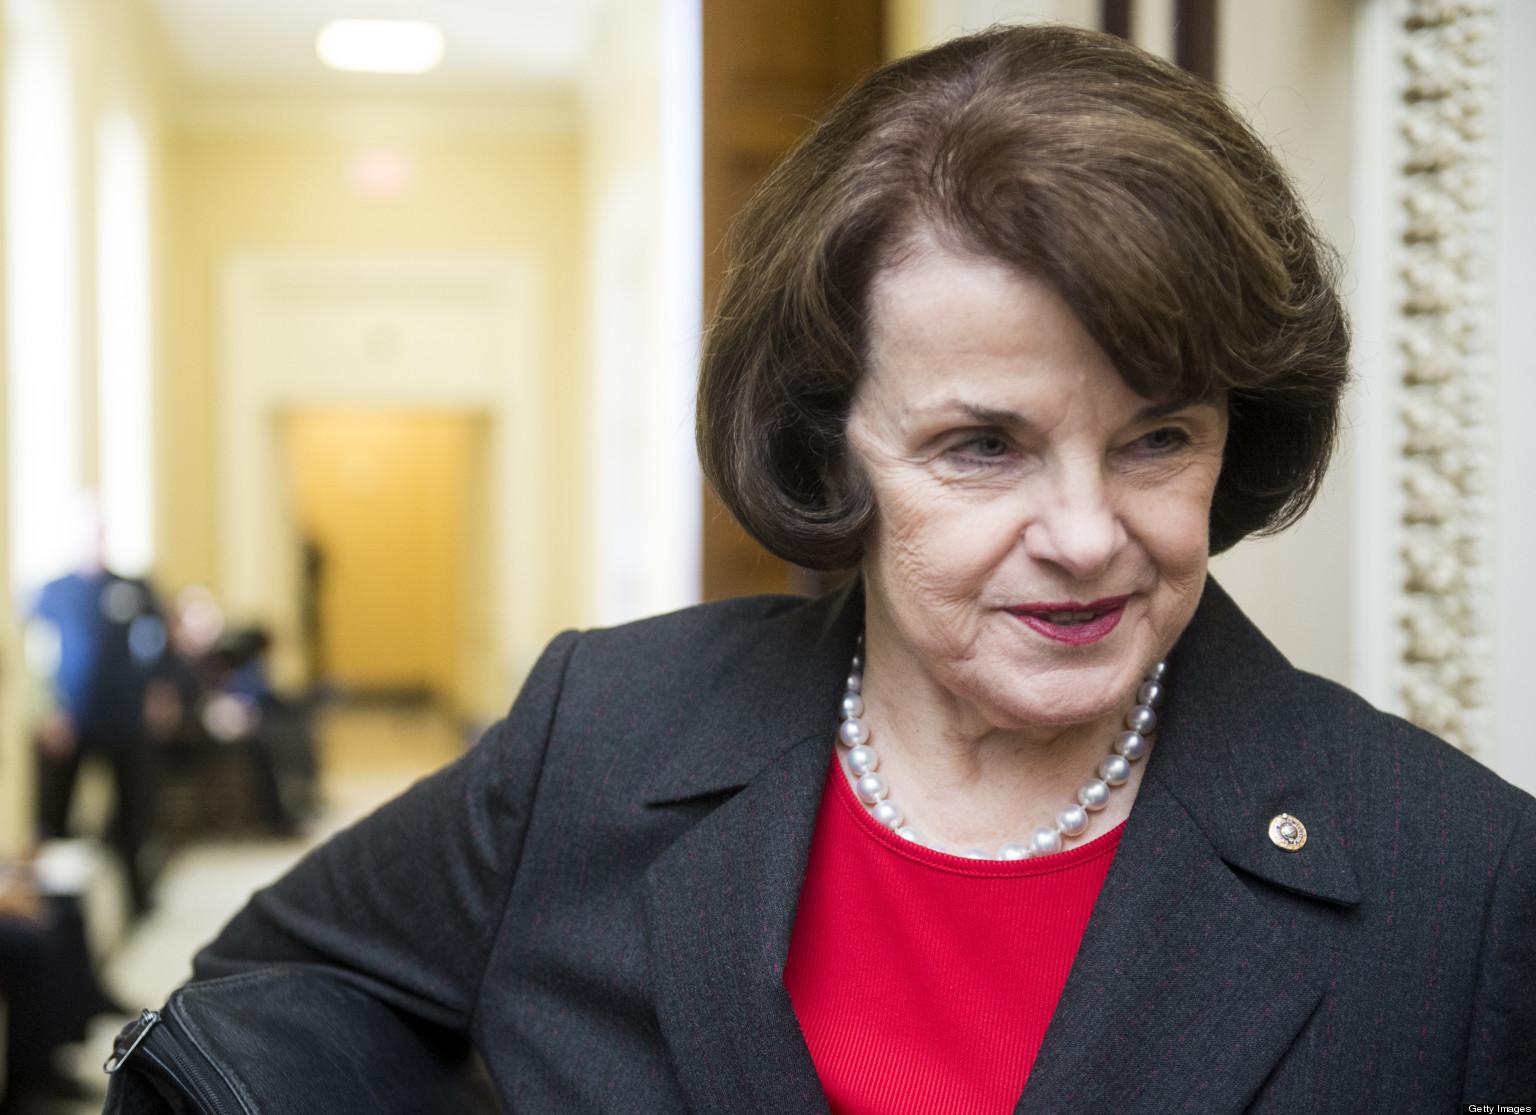 Lawmakers Split On 'Enemy Combatant' Status